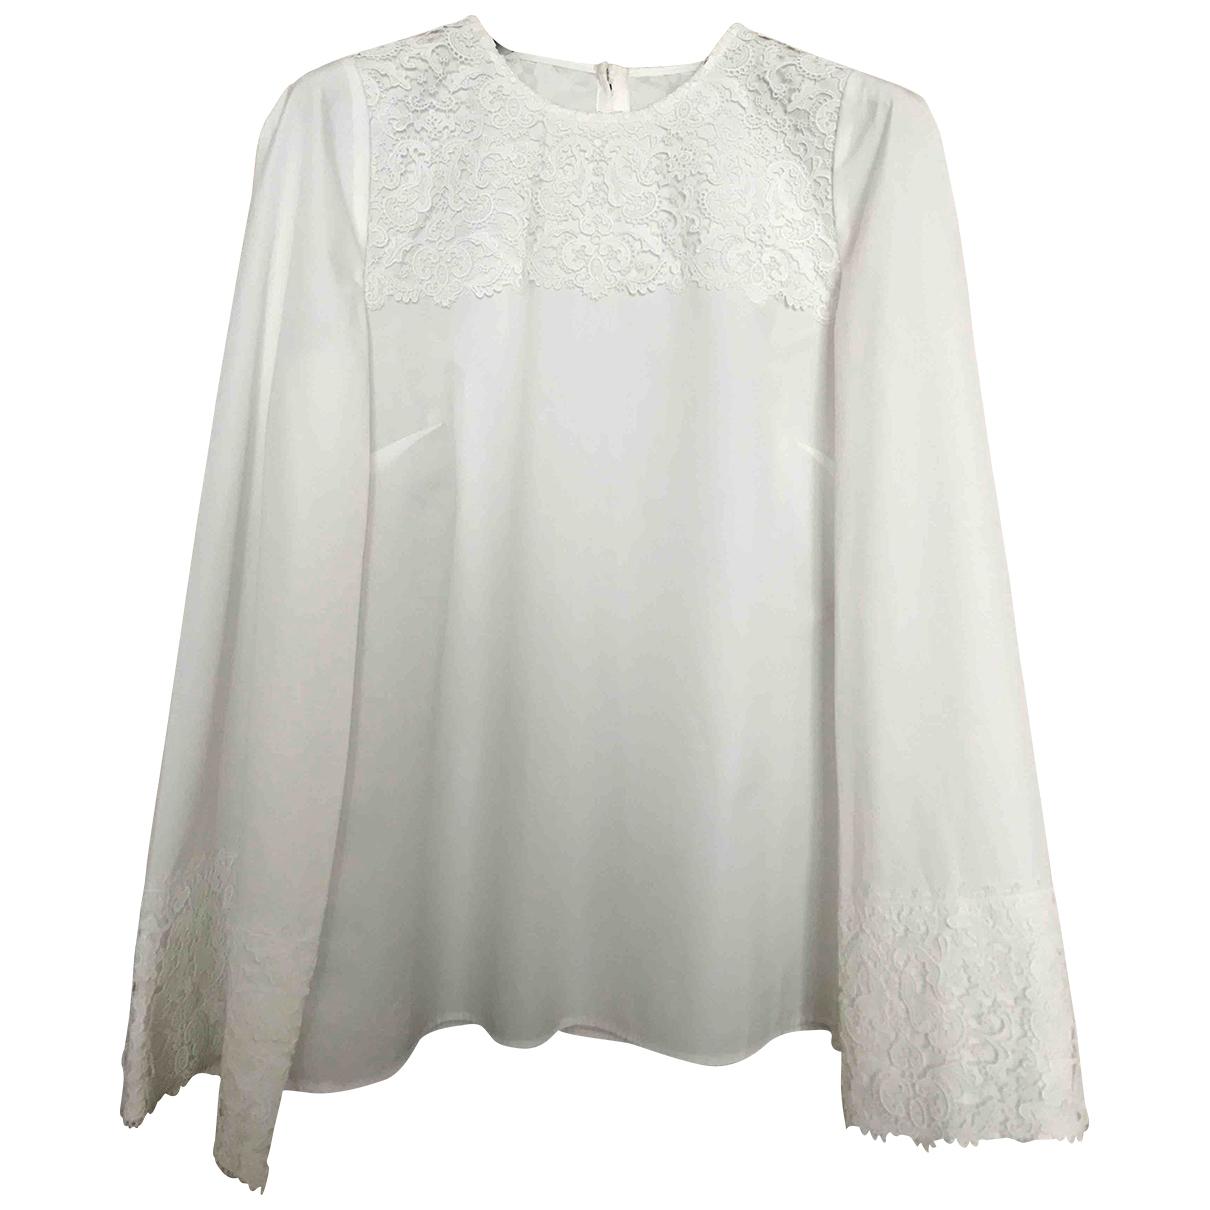 Dolce & Gabbana \N Top in  Weiss Baumwolle